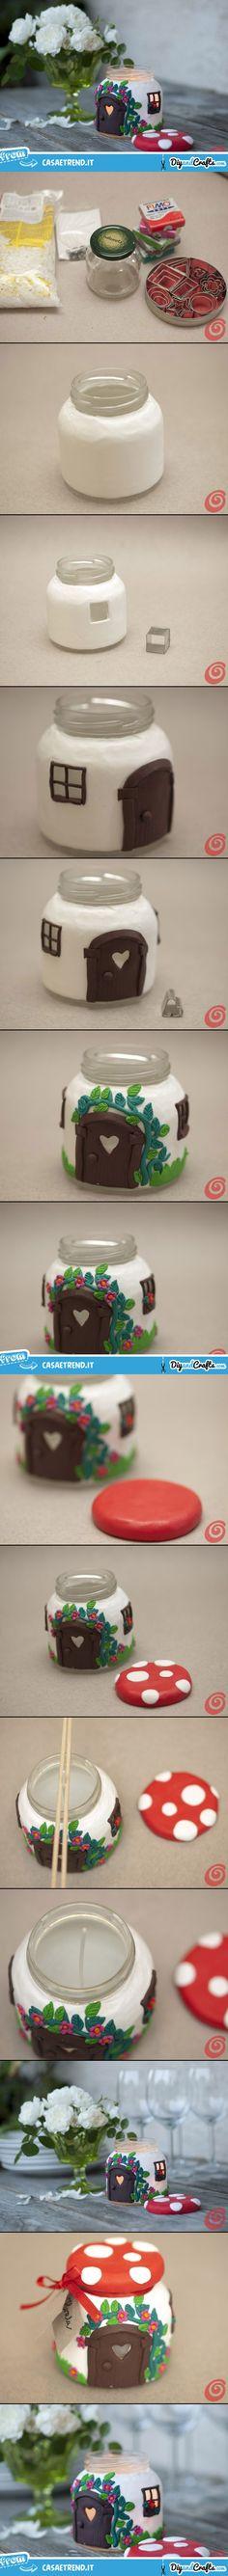 DIY Glass Jar Mushroom